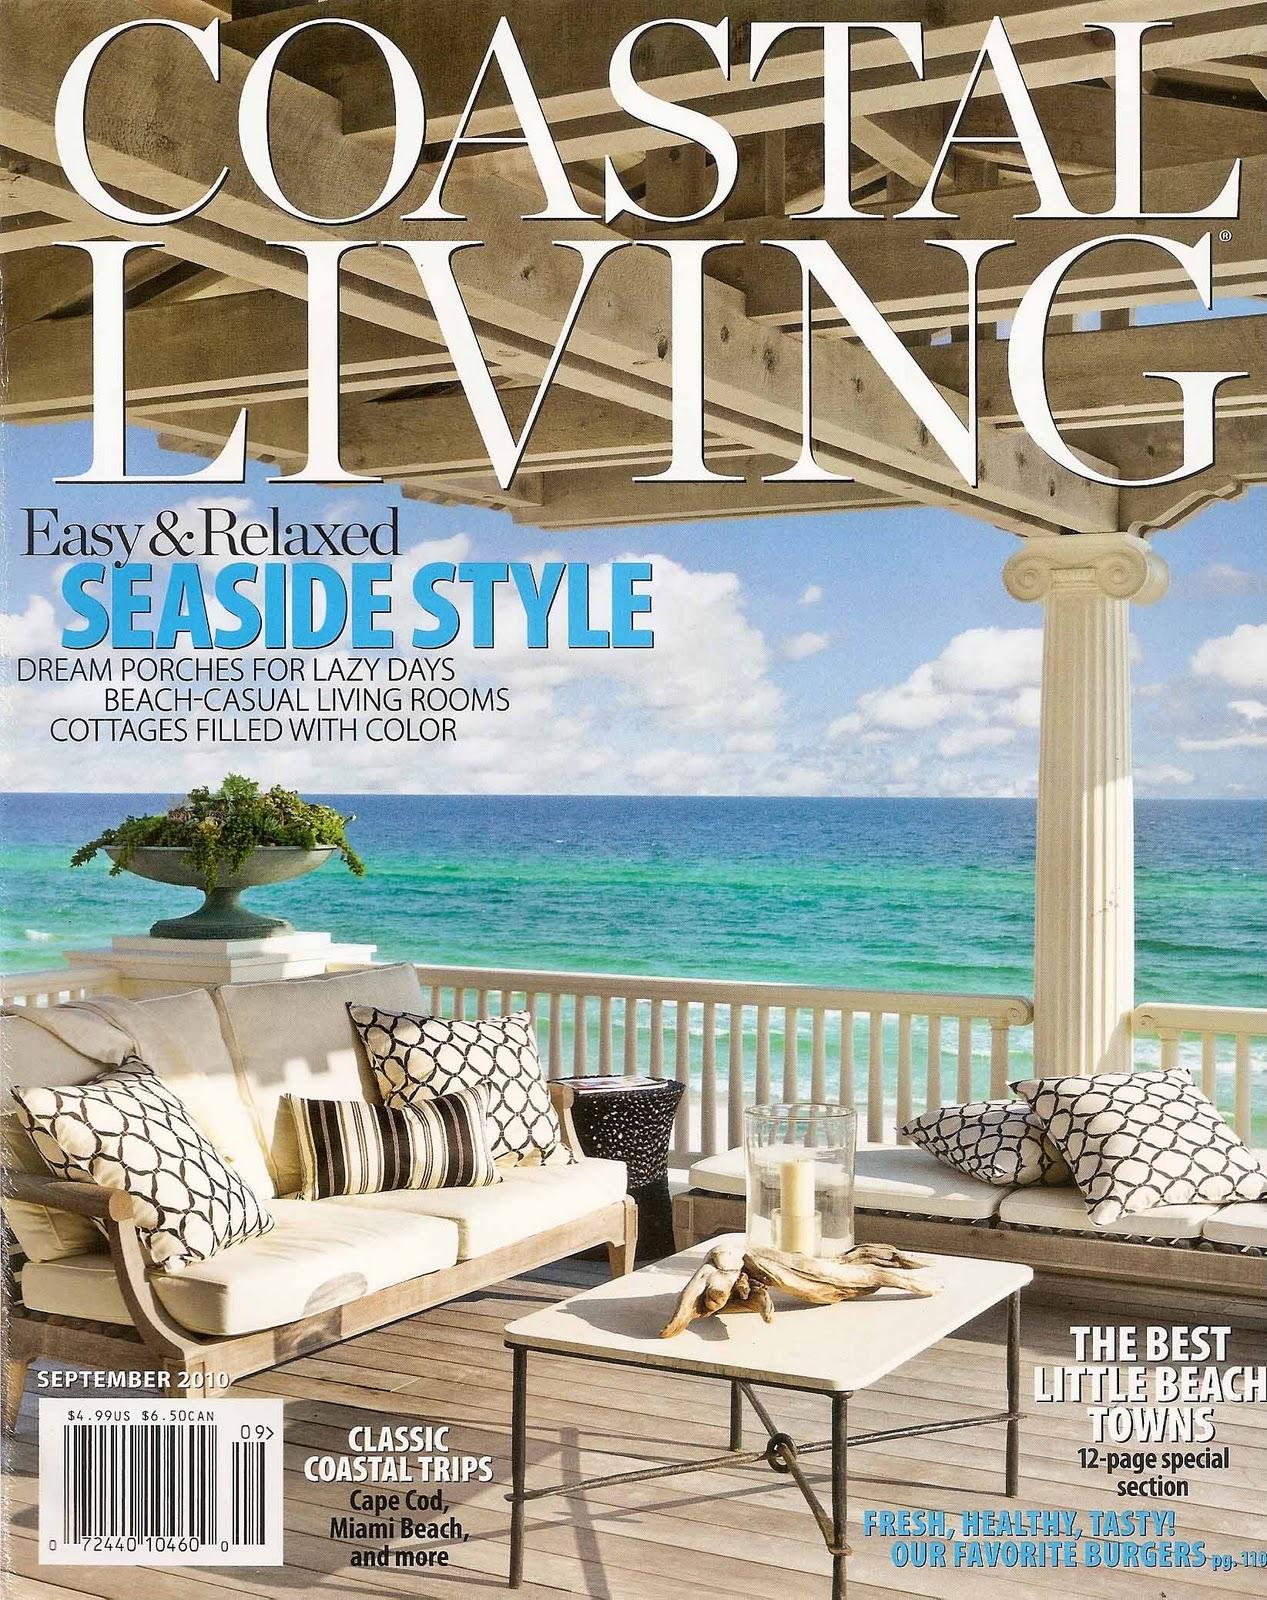 Living Magazine press testimonials iron fish coastal sculptor allen